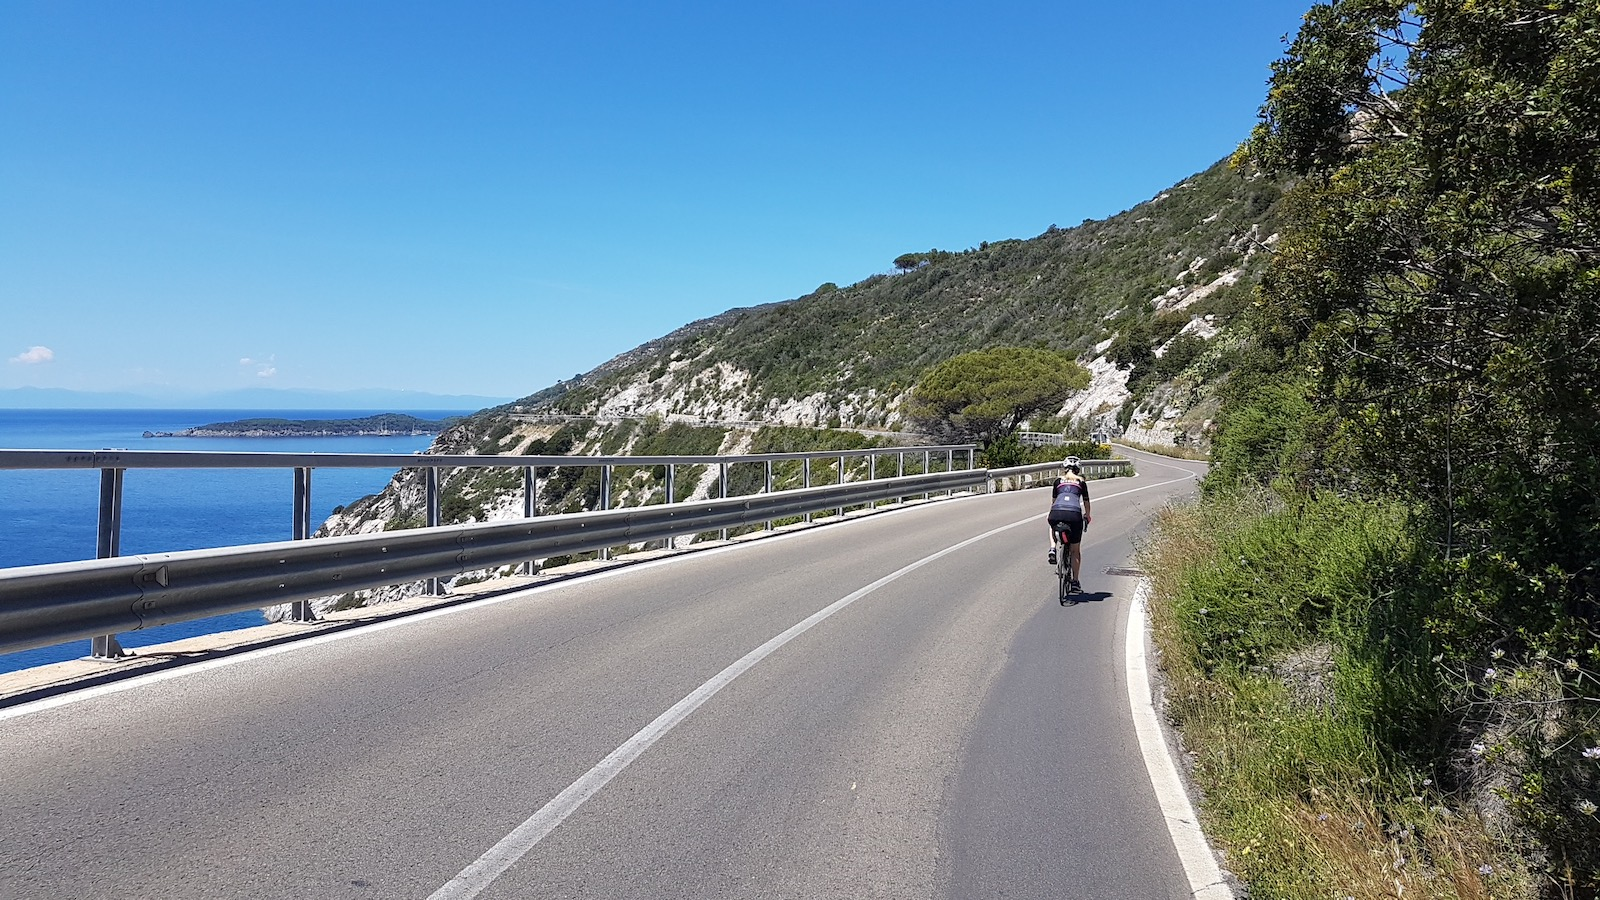 Isola d'Elba Ovest (DX) 6